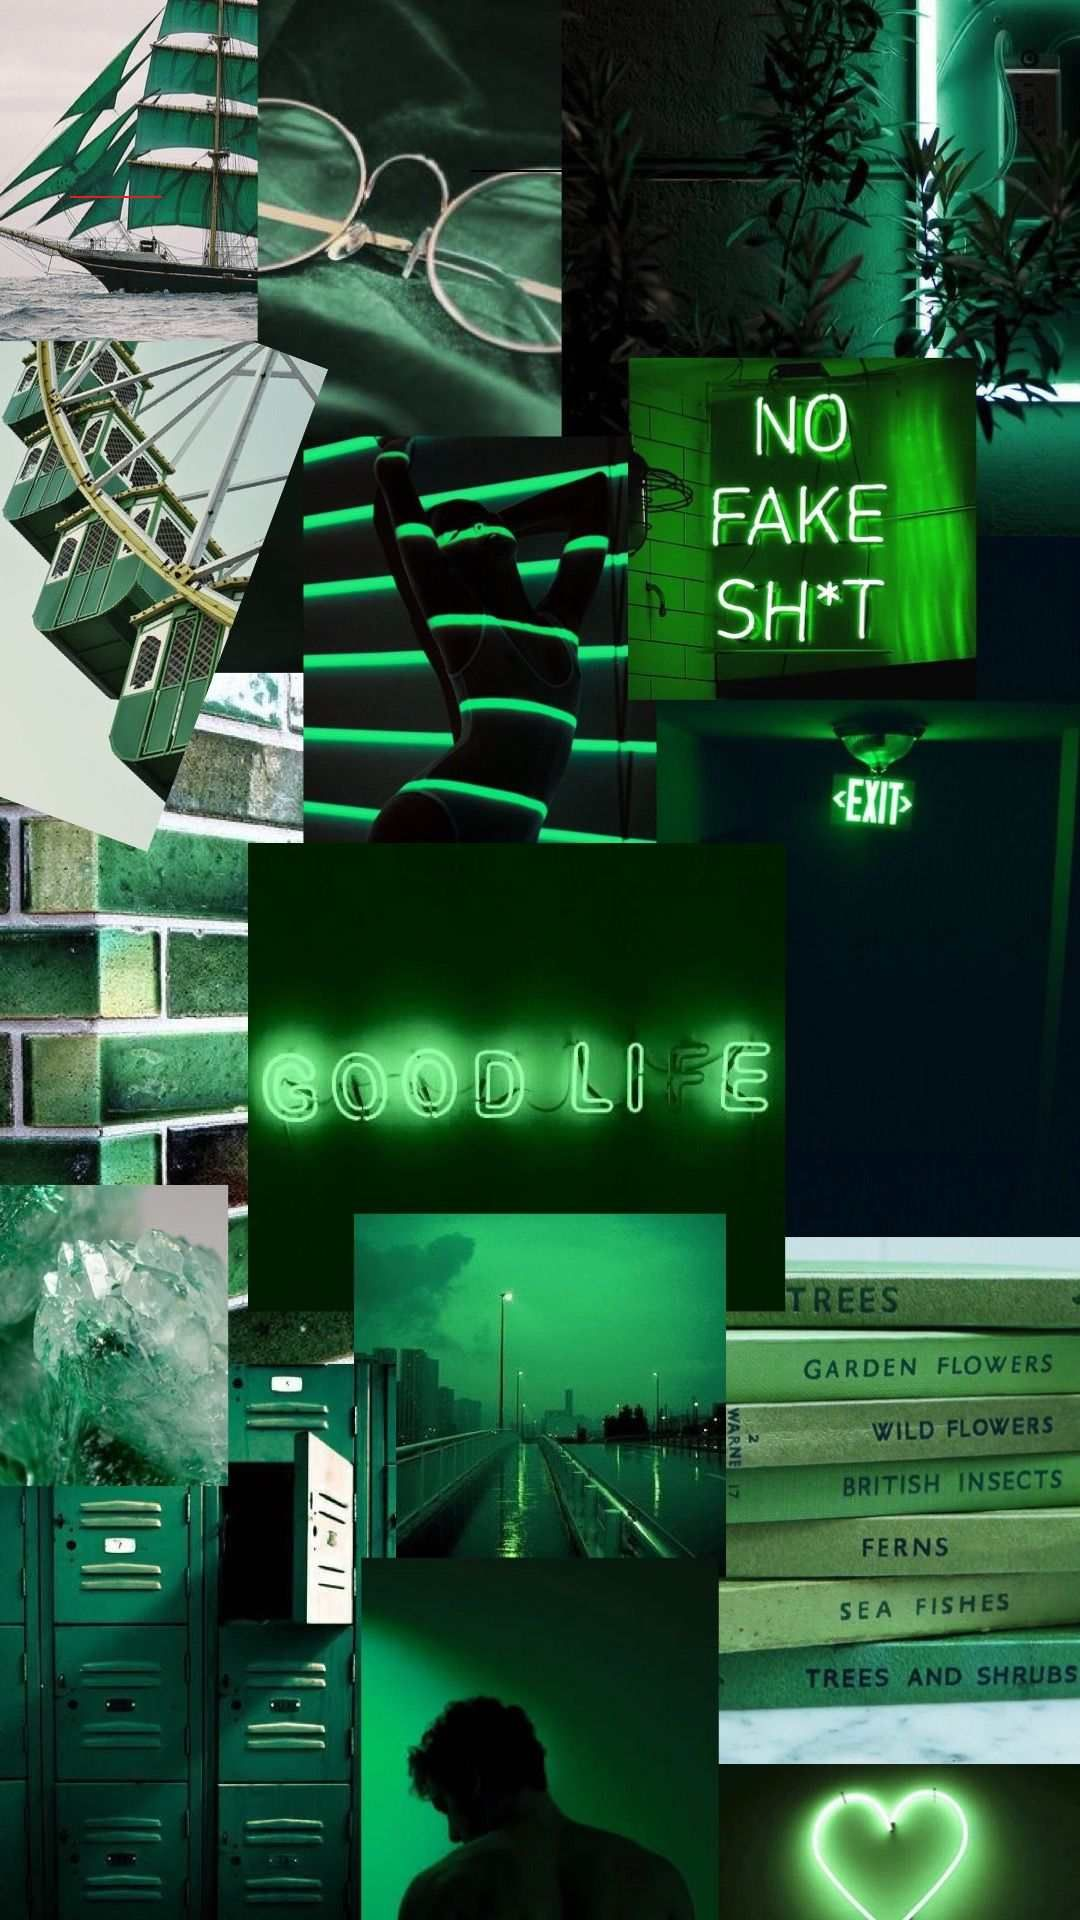 Wallpaper Iphone Green Aesthetic Baggrundiphone Green Aesthetic Dark Green Aesthetic Iphone Wallpaper Tumblr Aesthetic